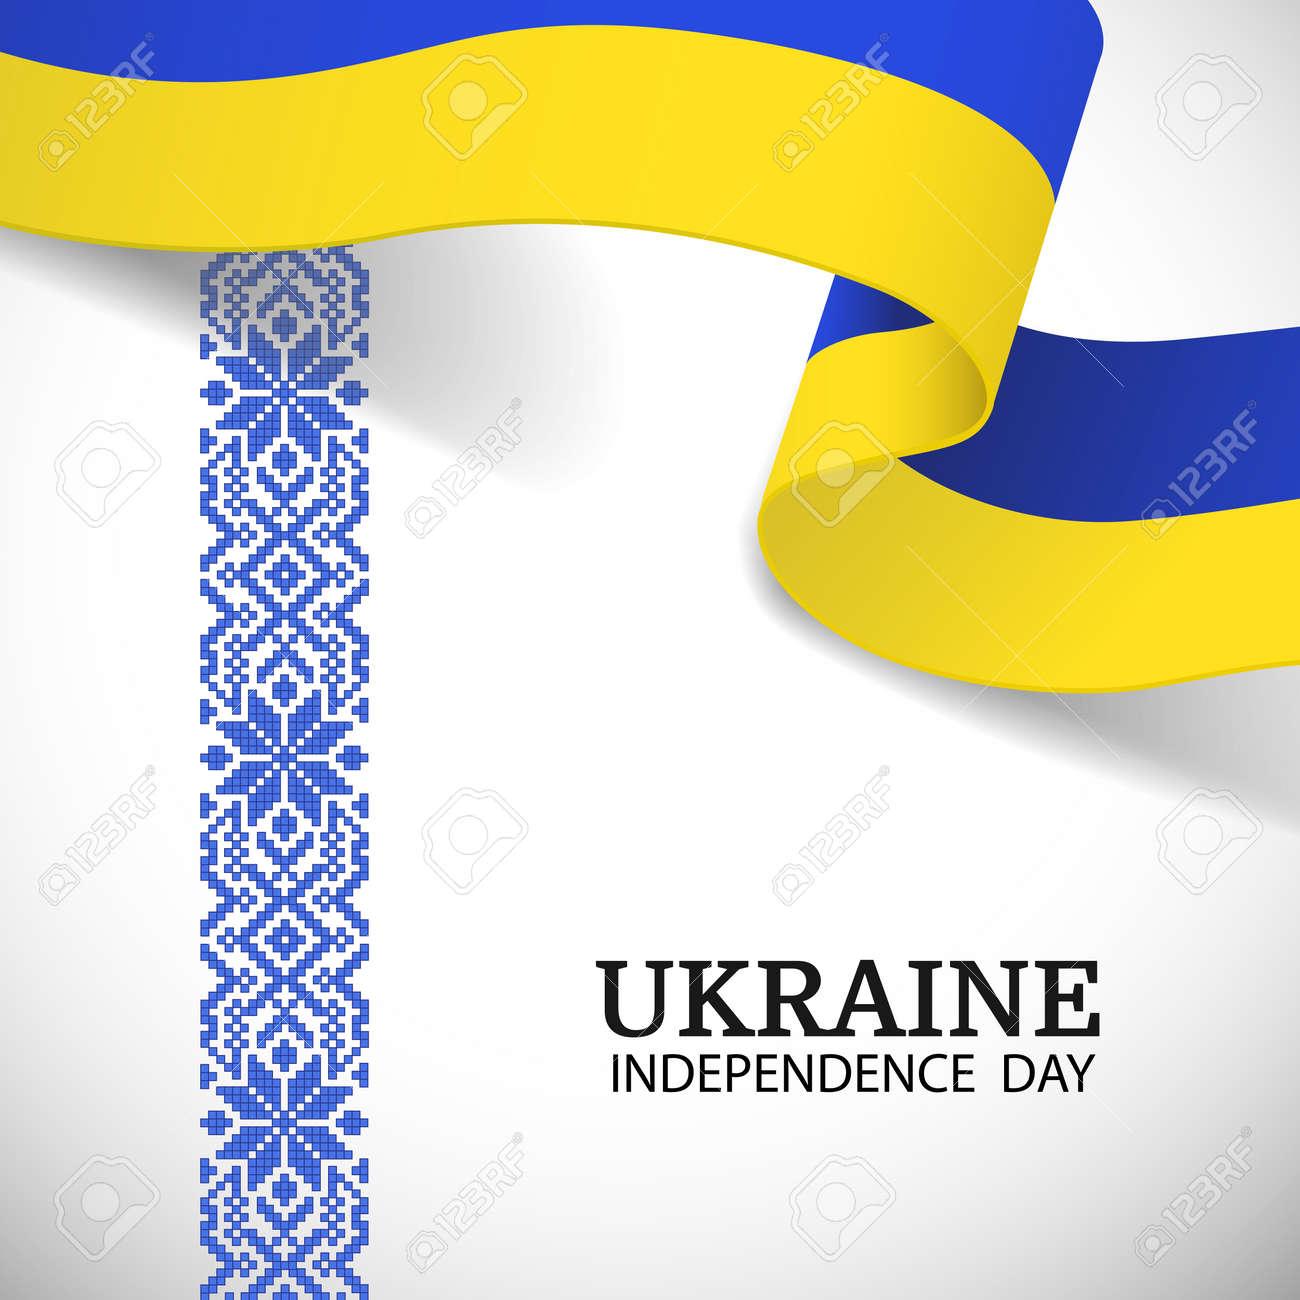 Vector Illustration of Ukraine Independence Day. National pattern. - 170744907